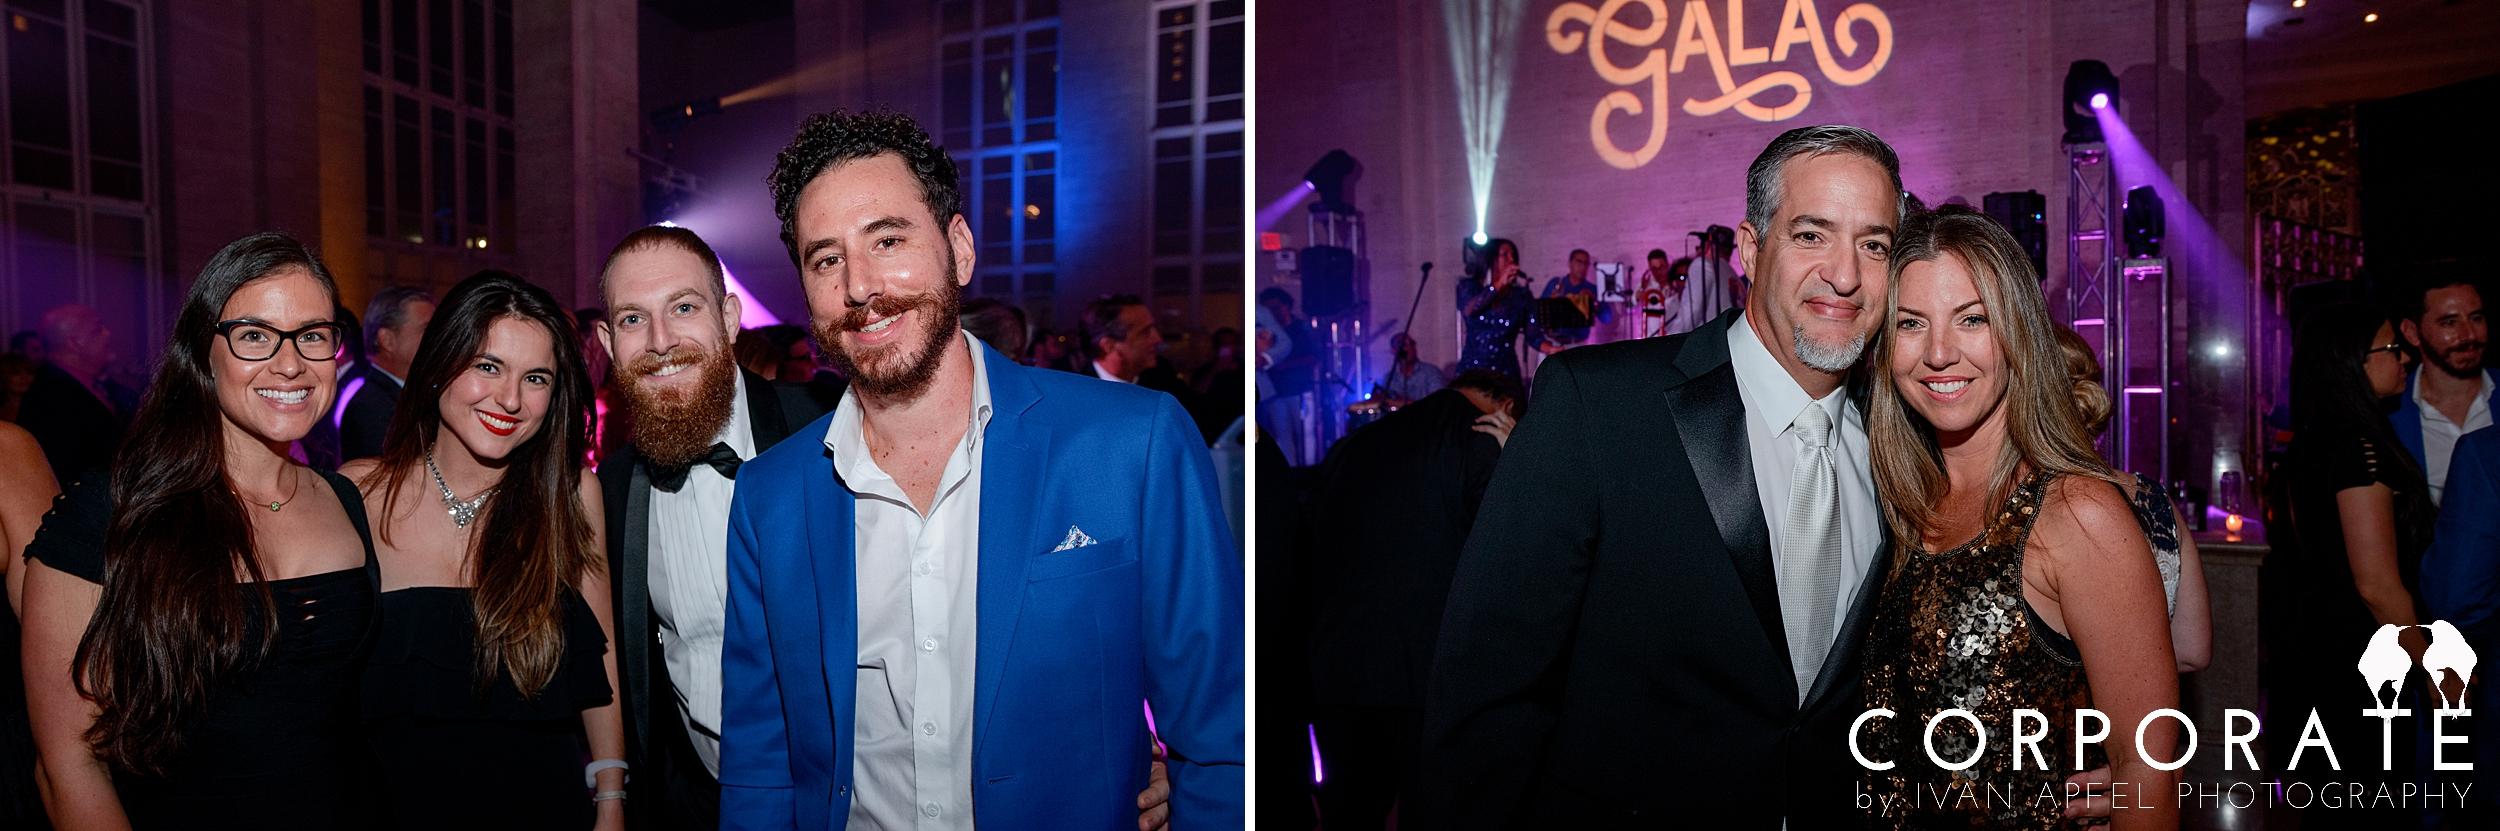 Miami Corporate Event Photographer Non-Profit Blue Missions Gala_0018.jpg